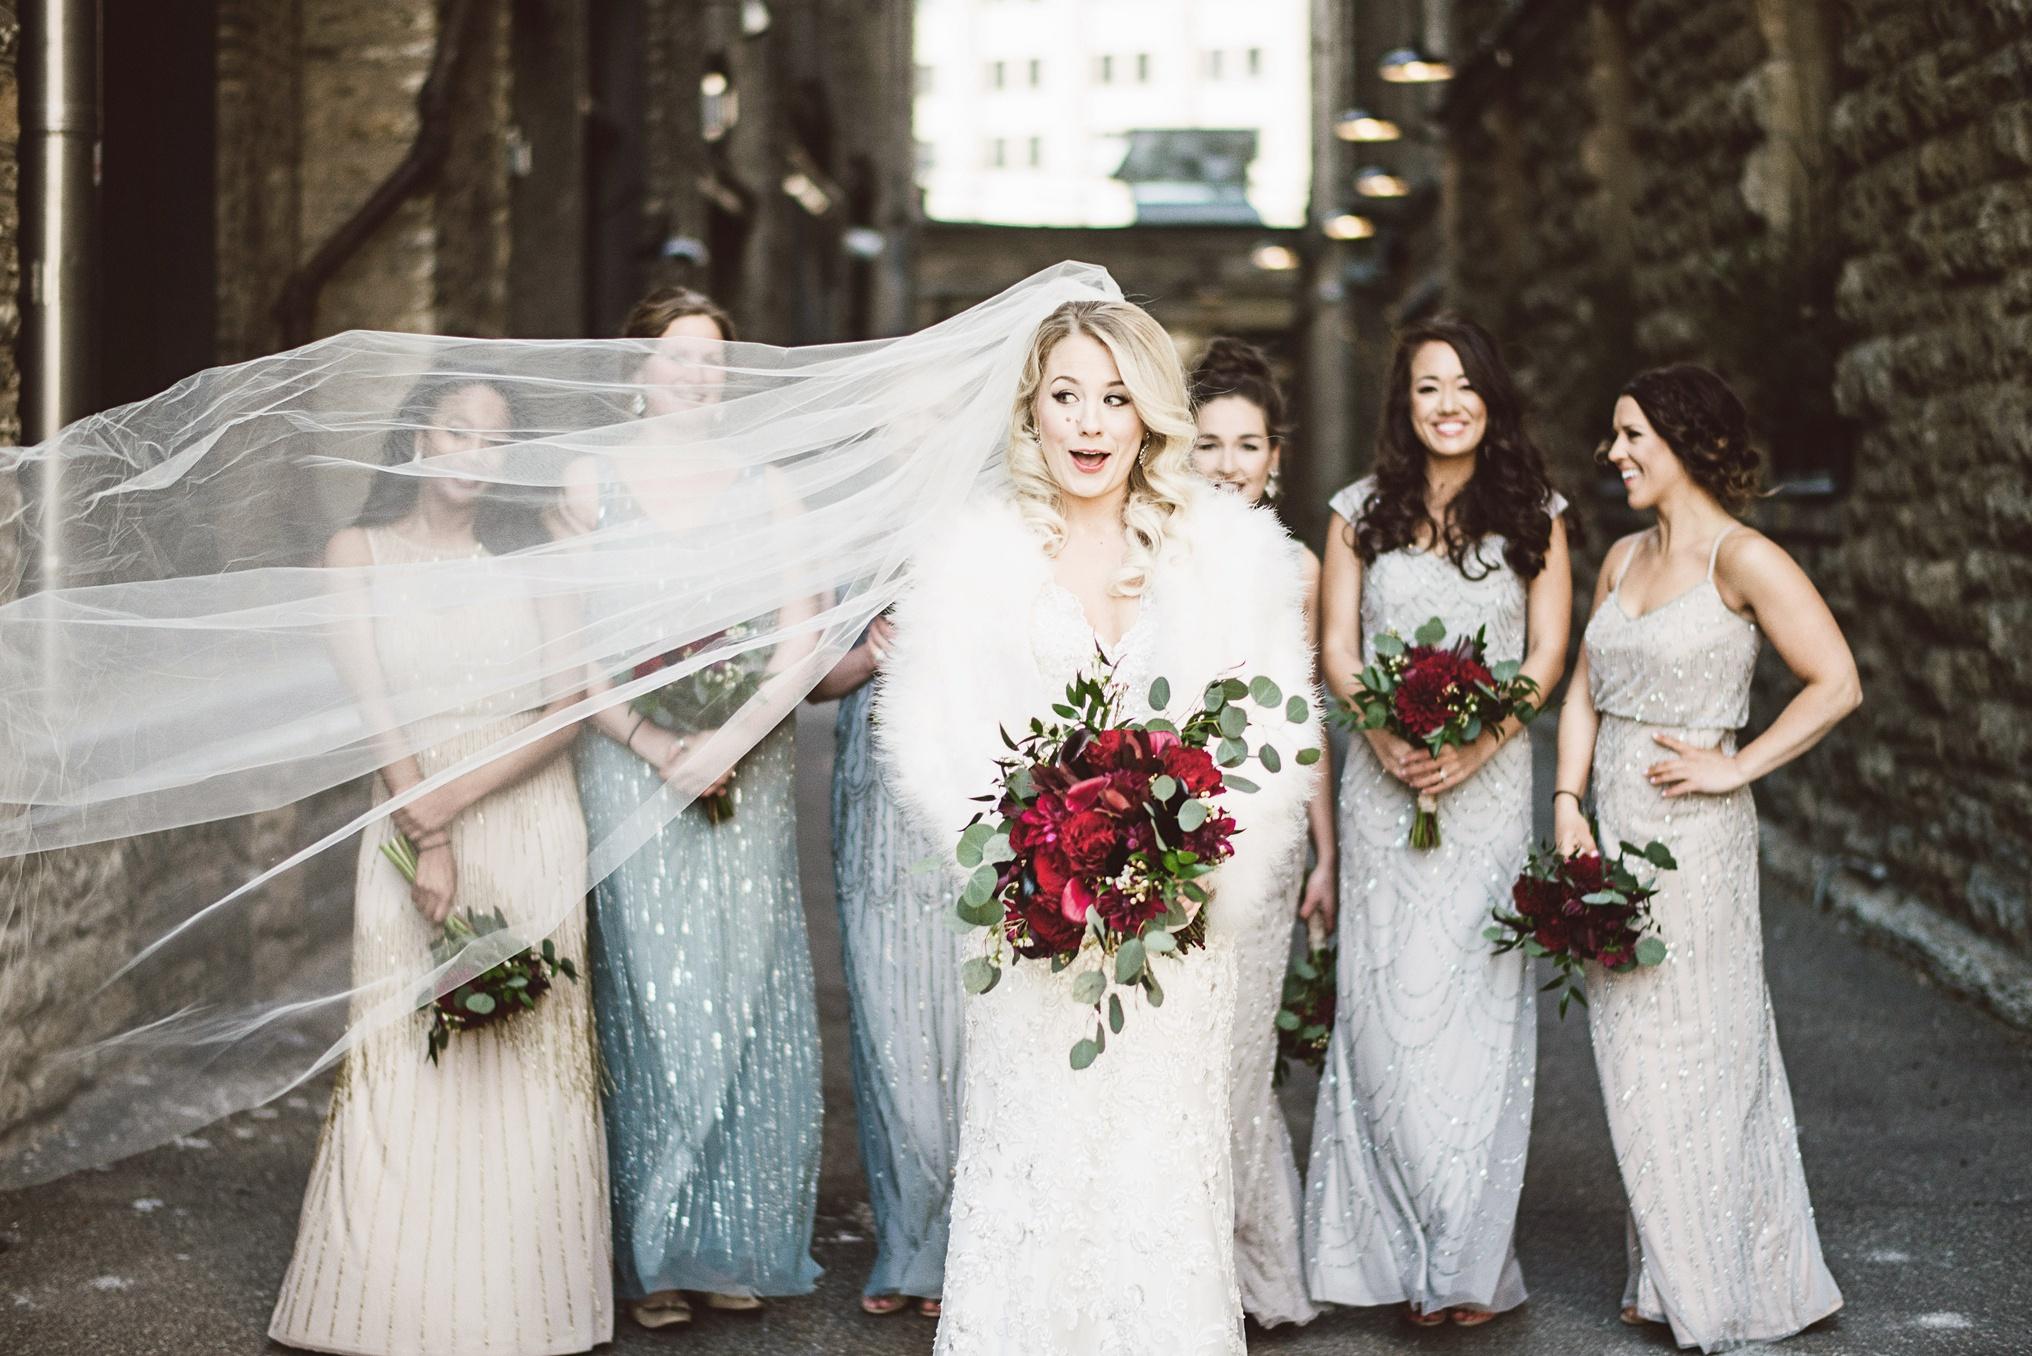 best_wedding_photography_2017_by_lucas_botz_photography_165.jpg